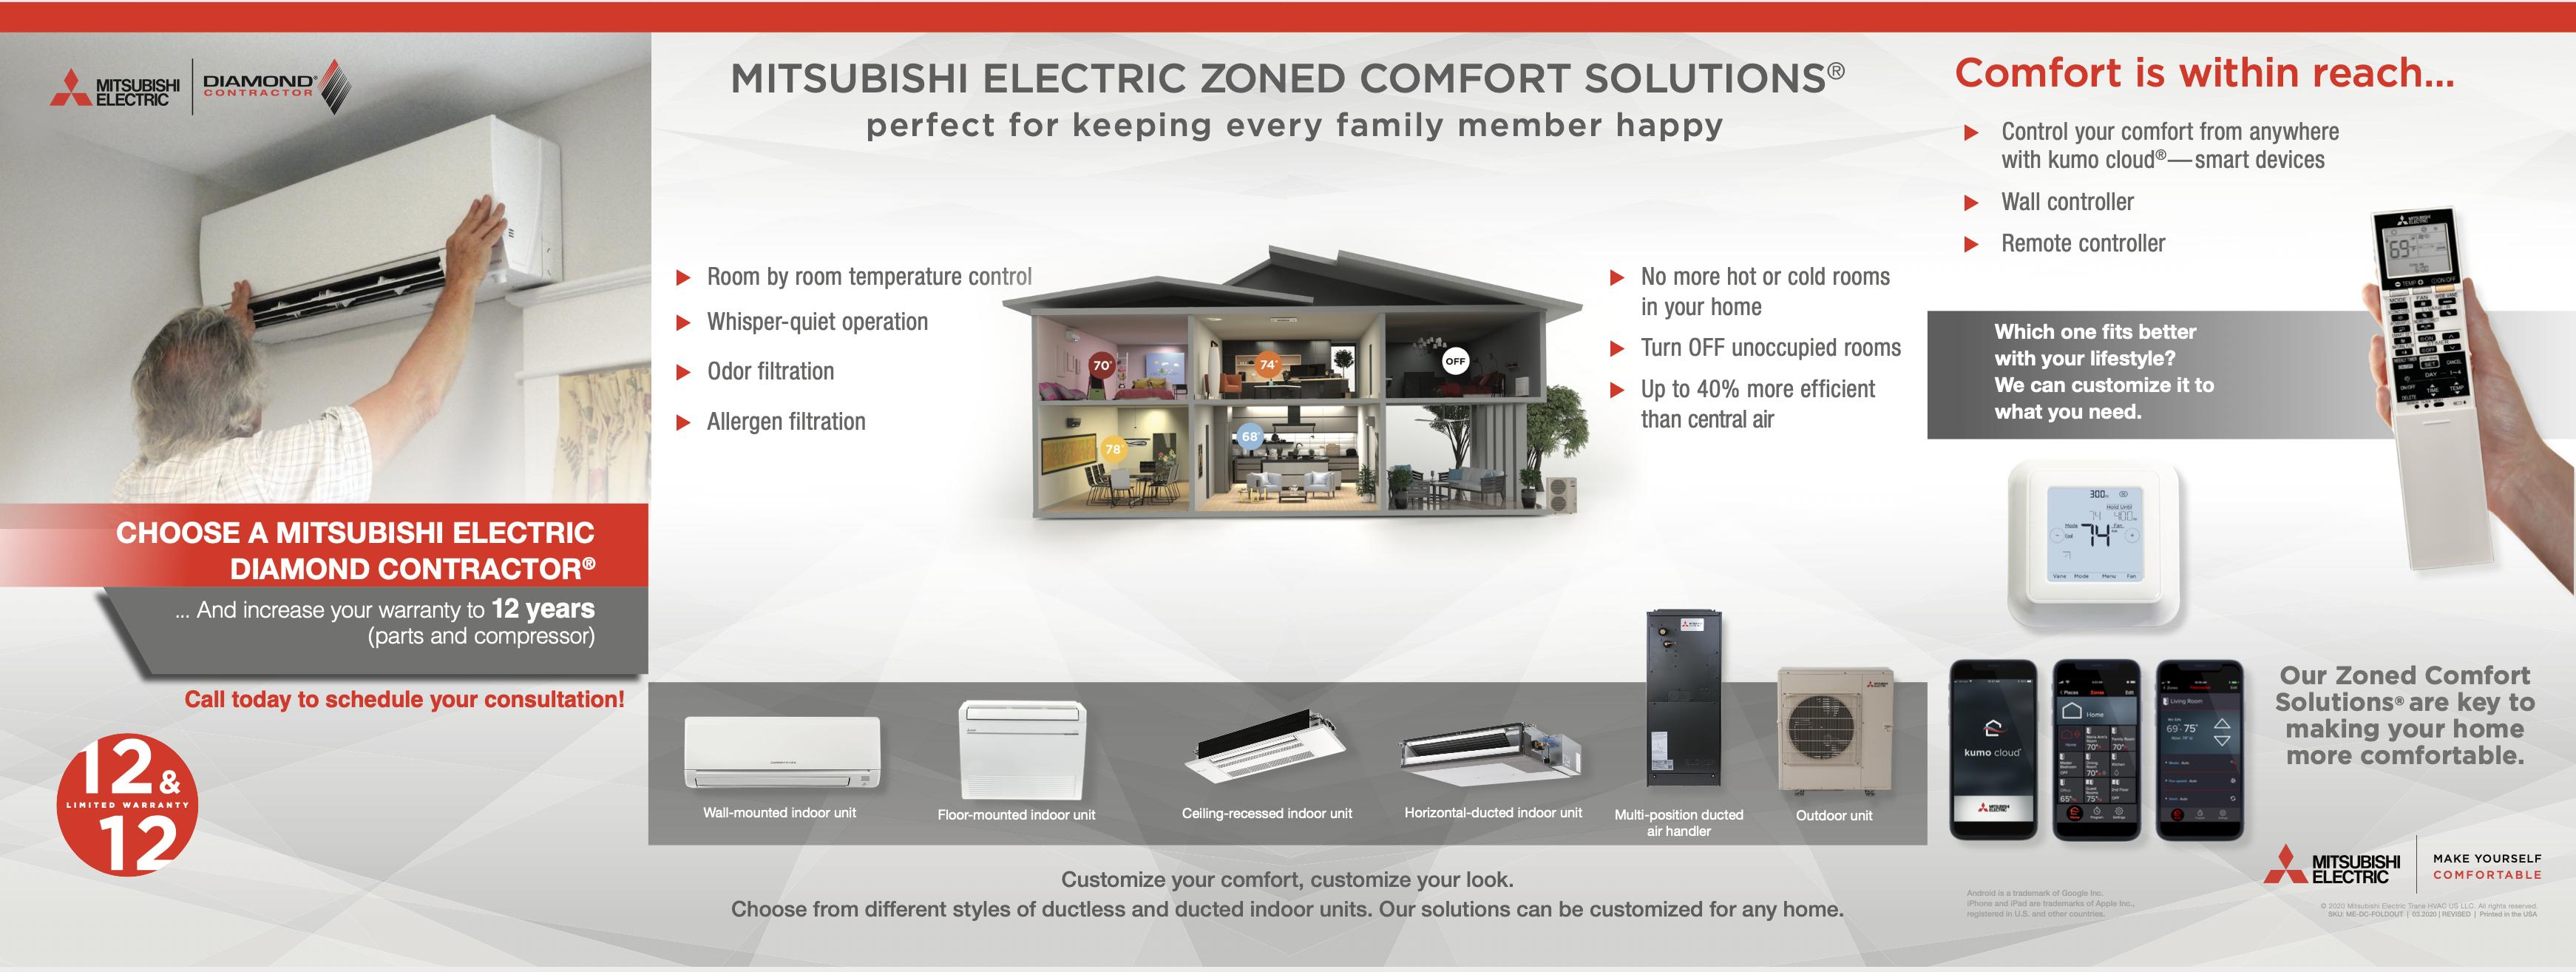 Mitsubishi Electric zoned comfort solutions brochure screenshot